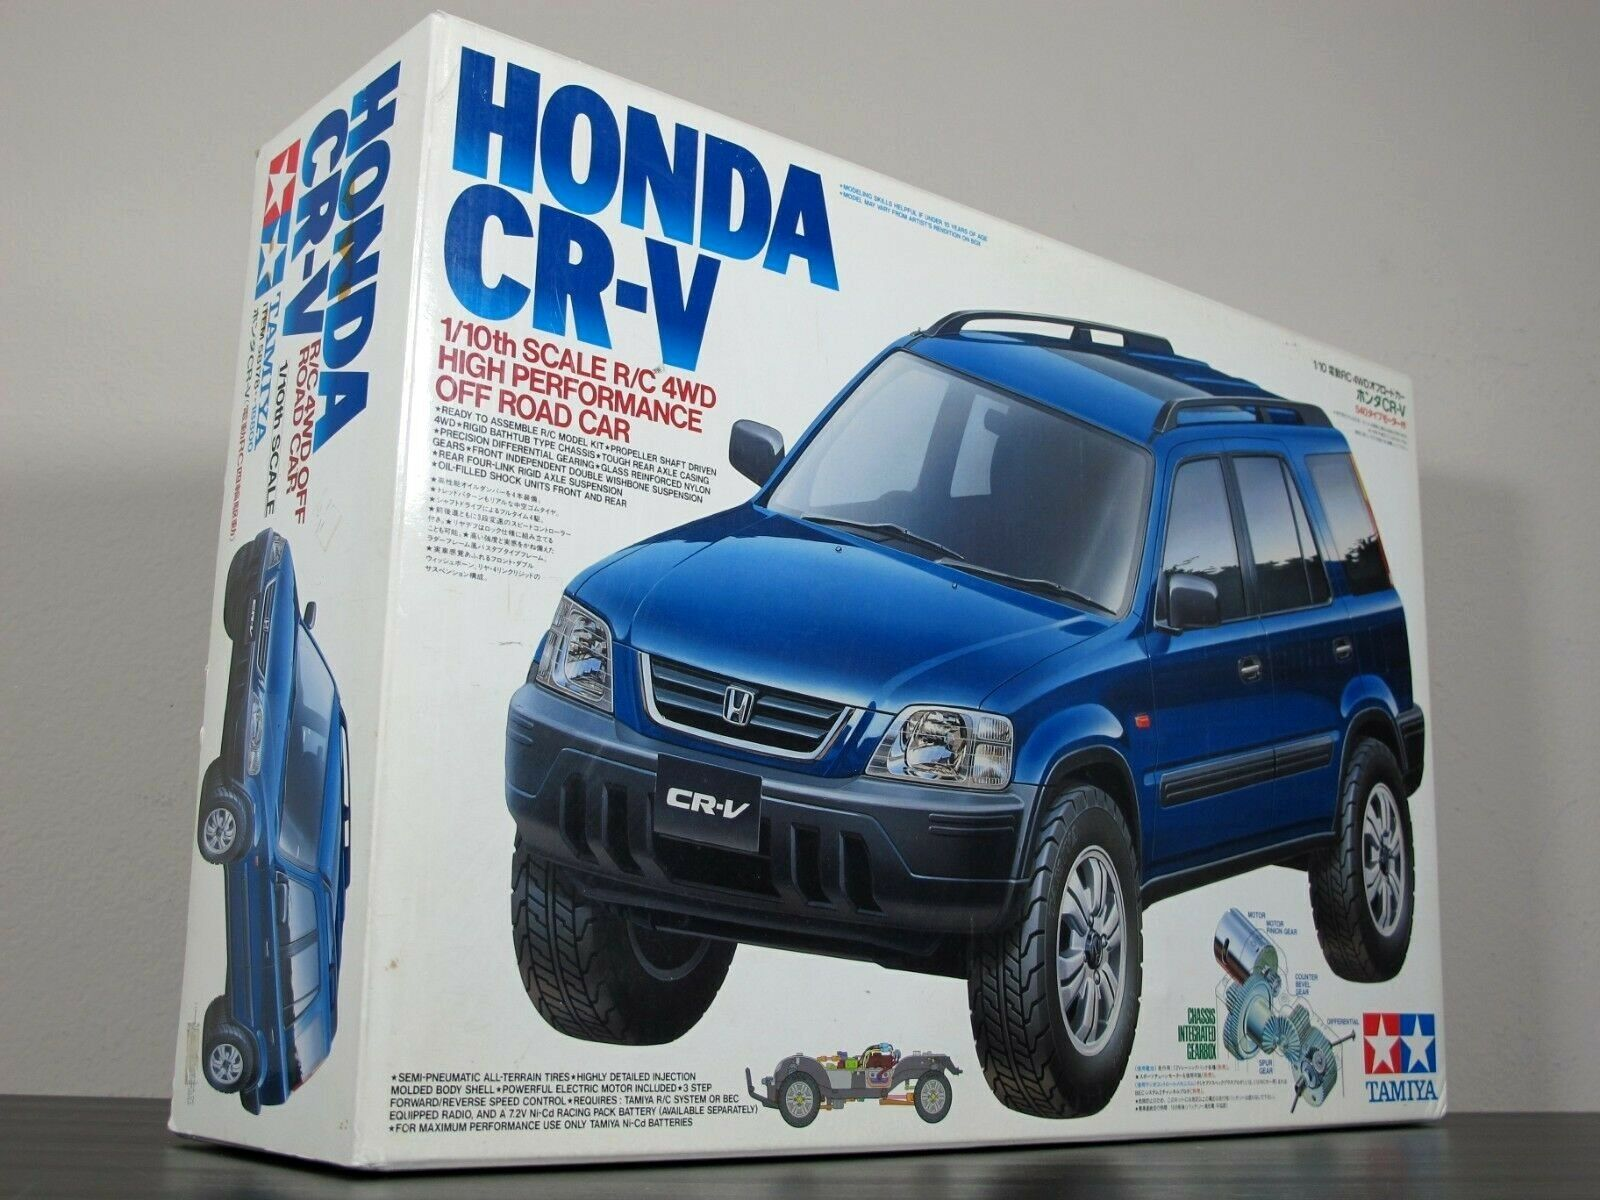 New in Box Vintage Tamiya 1 10 R C 4WD Honda CRV CR-V Off Road Kit CR01